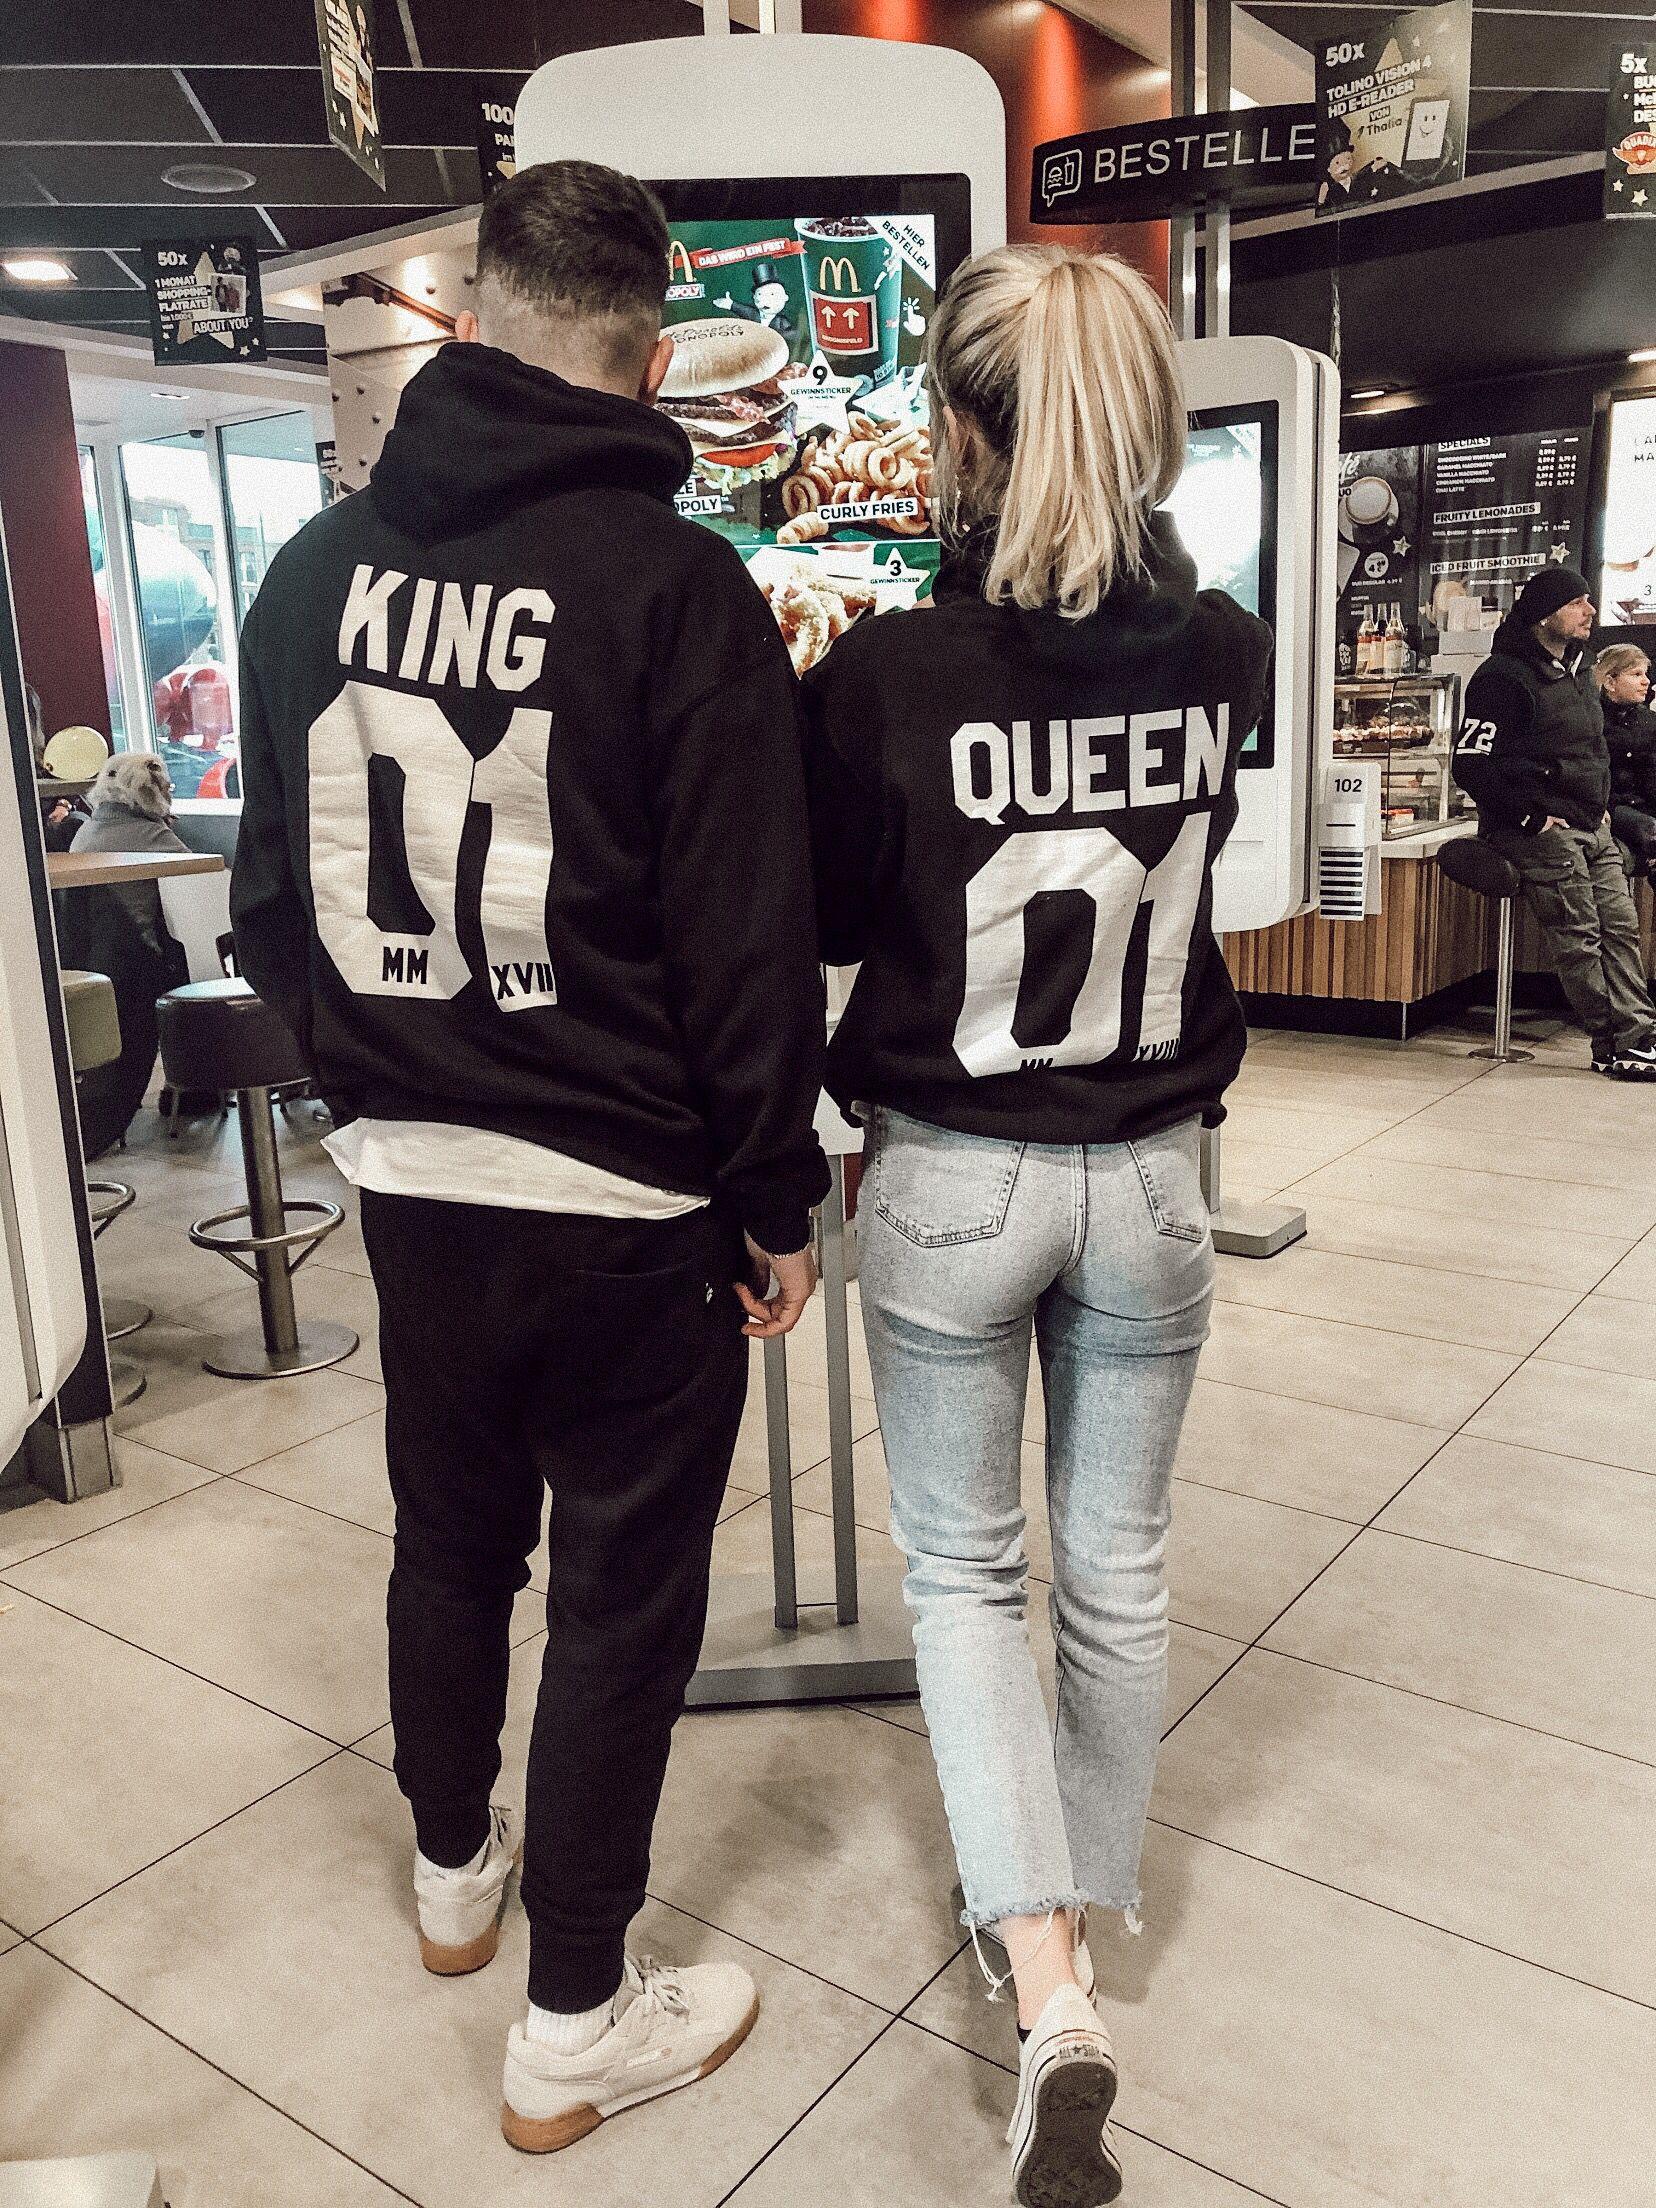 2er Set Hamburger Haenger ® King 01 & Queen 01 Hoodie